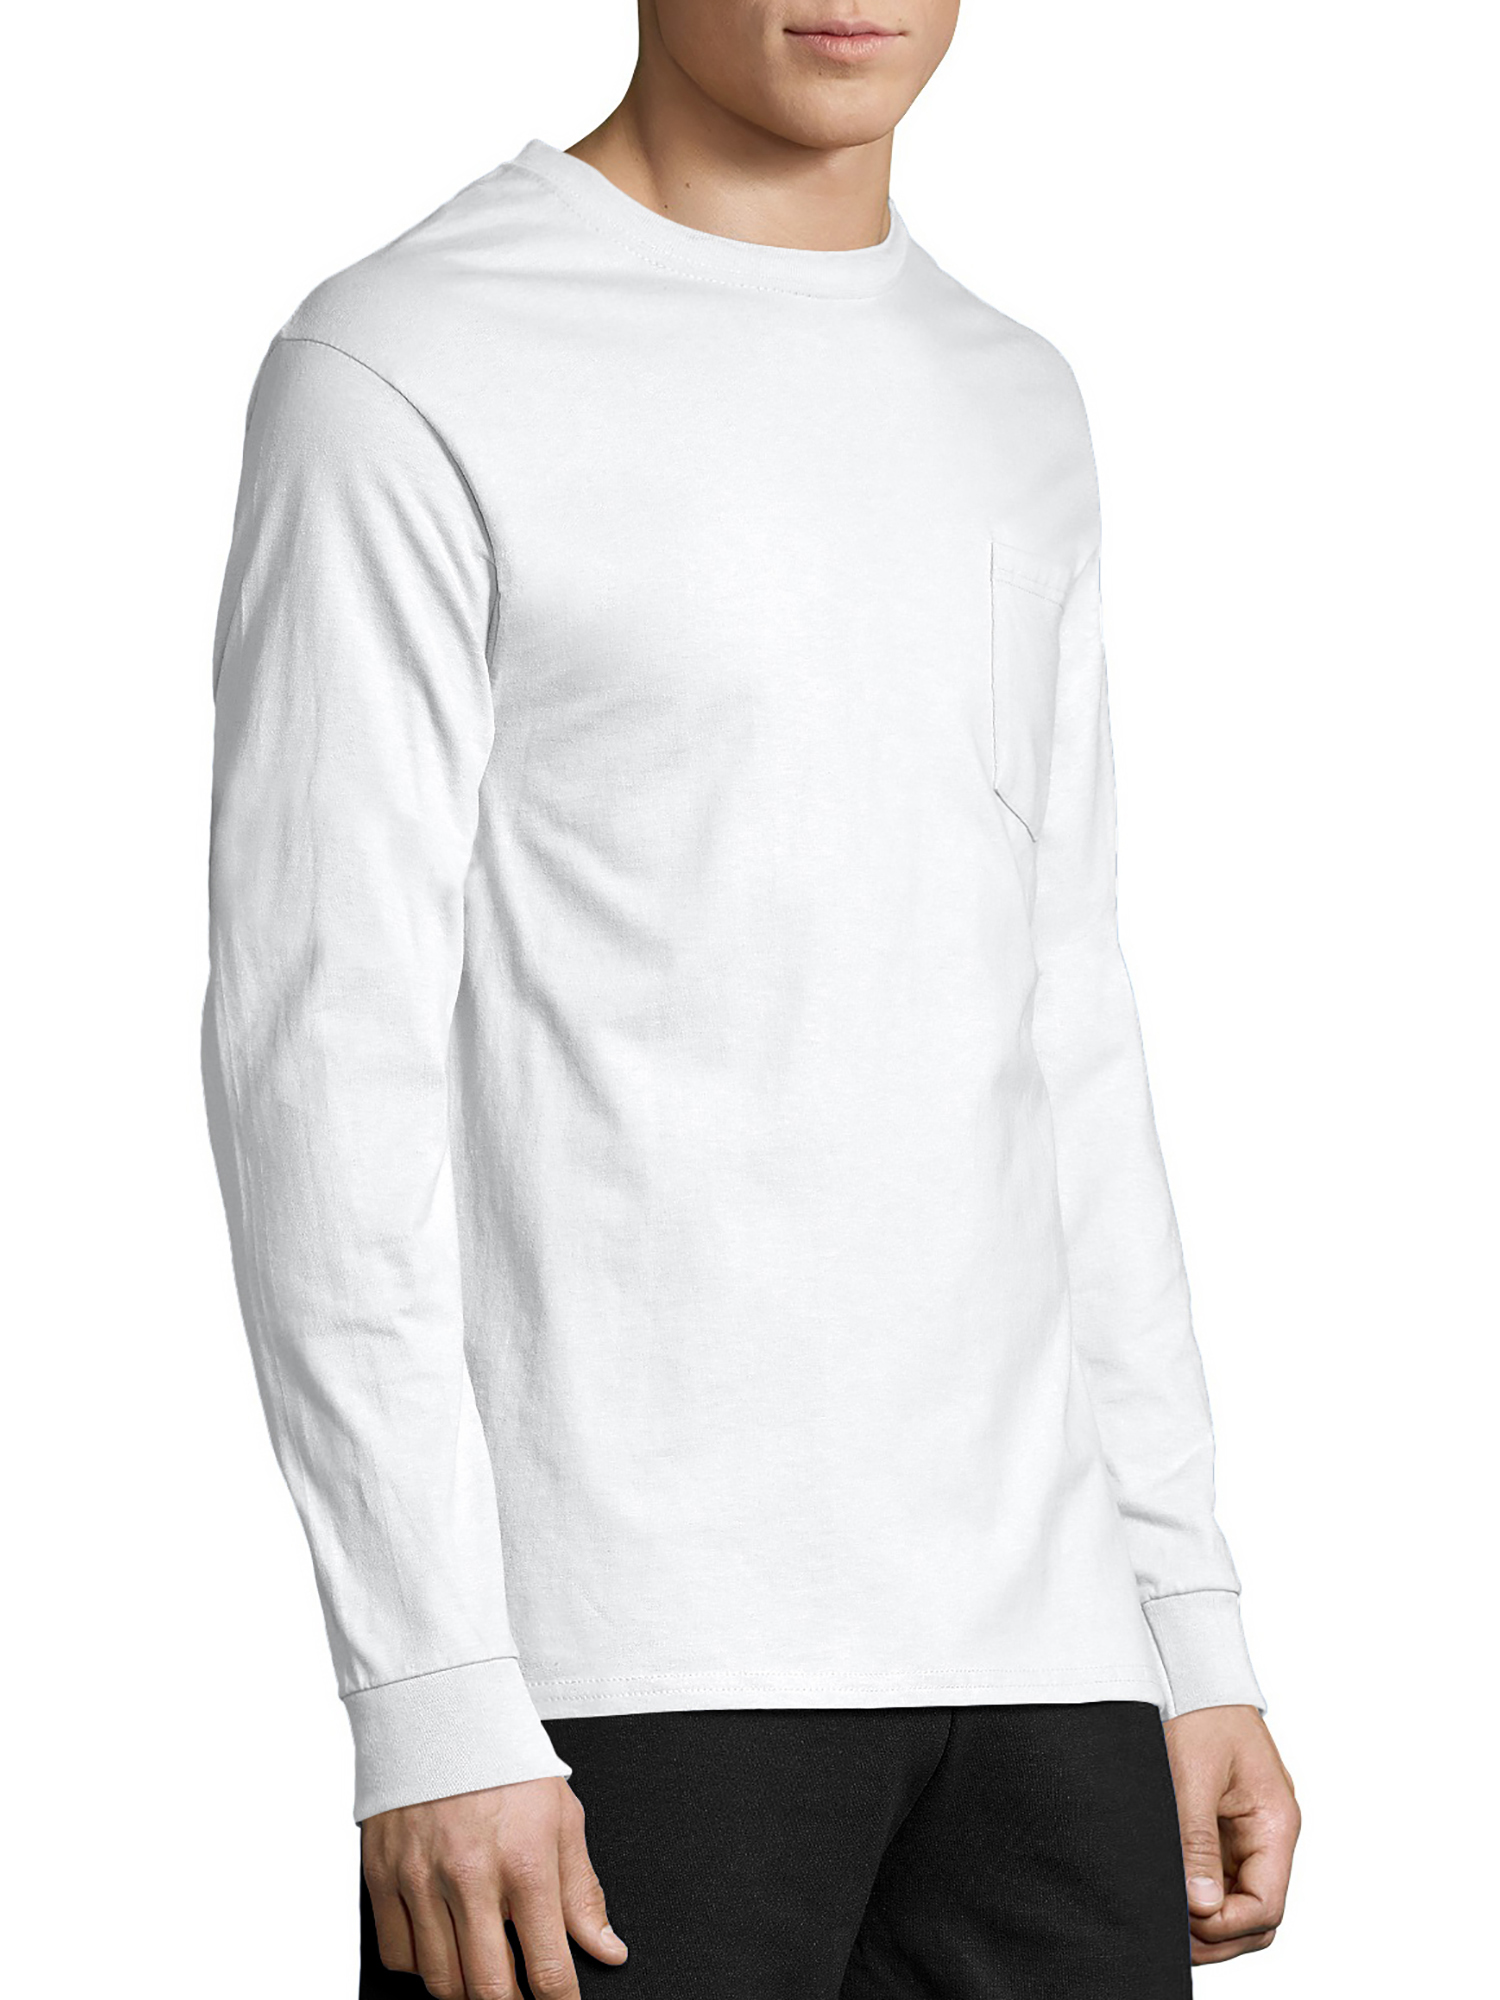 52f76d905f59 Hanes Mens Tagless long-sleeve T-shirt, 2 Pack Bundle for $12 - Walmart.com